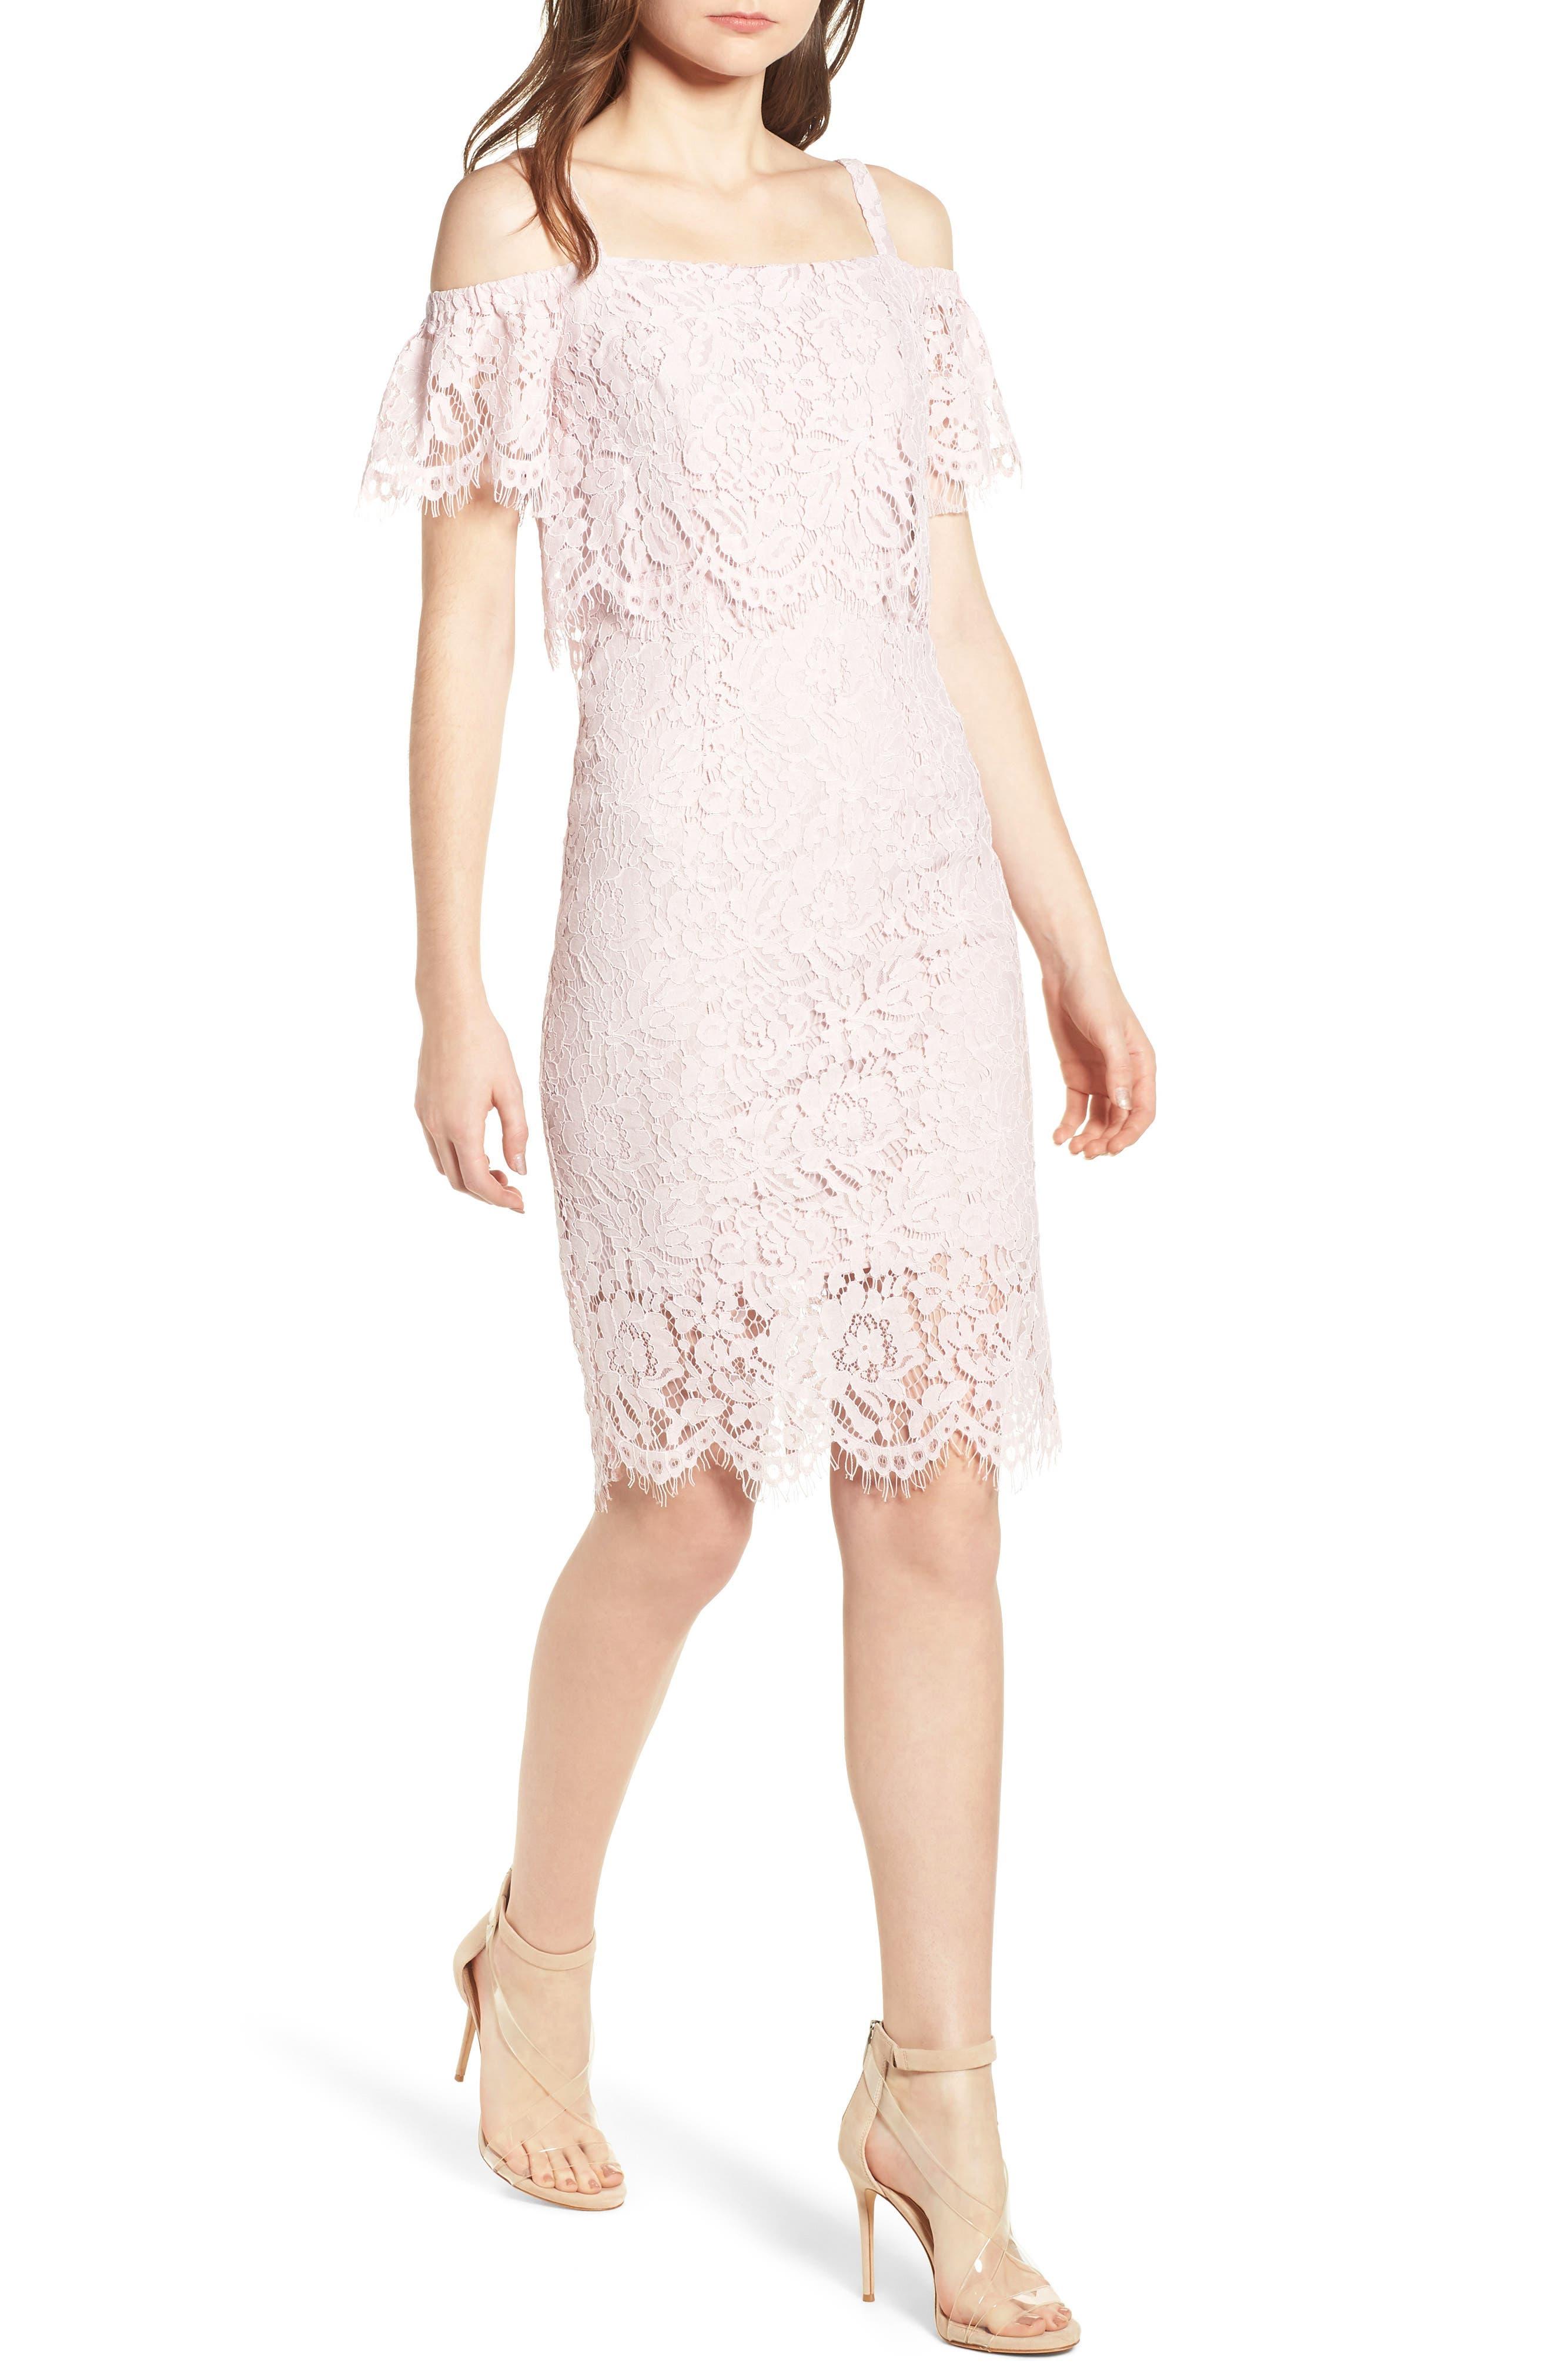 Popover Lace Dress,                             Main thumbnail 1, color,                             Pale Pink